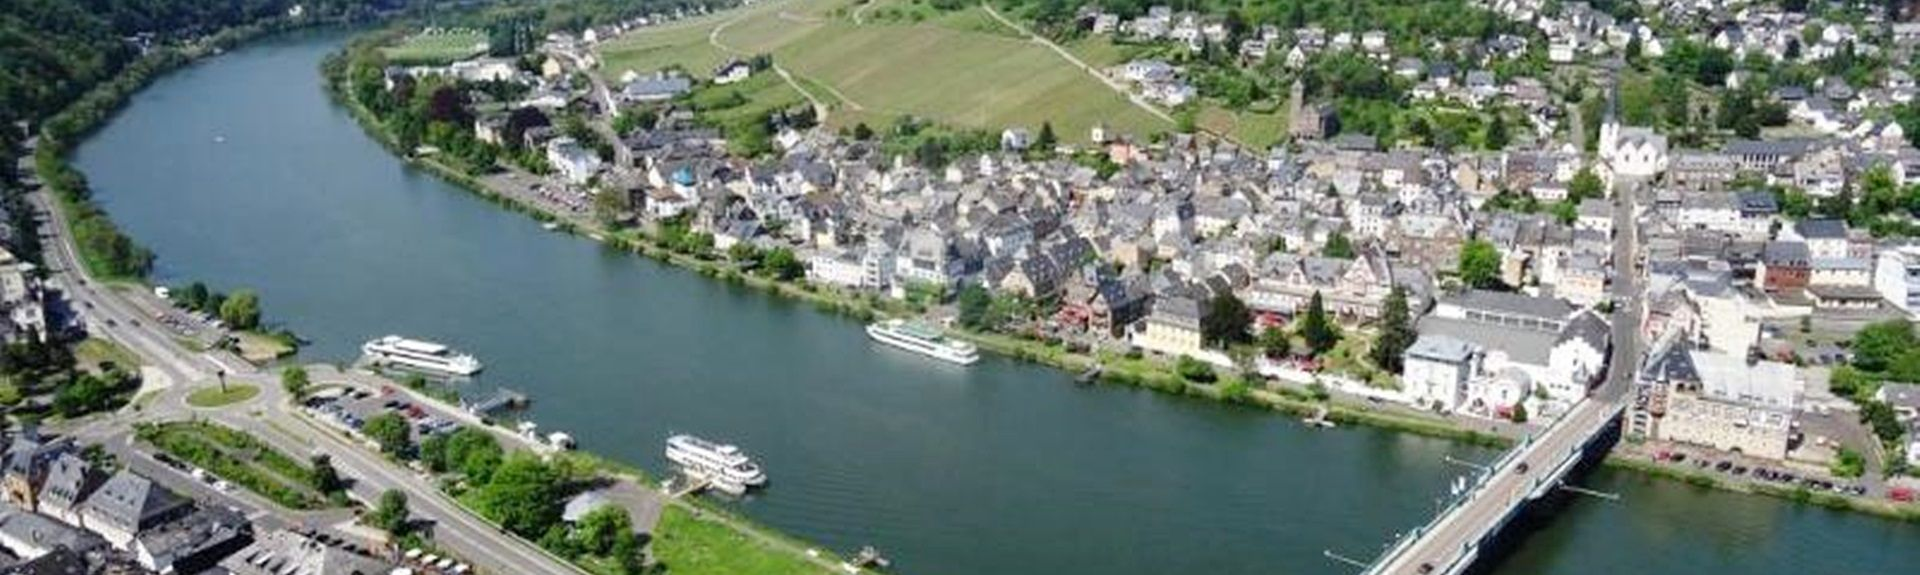 Trarbach, Traben-Trarbach, Rhineland-Palatinate, Allemagne